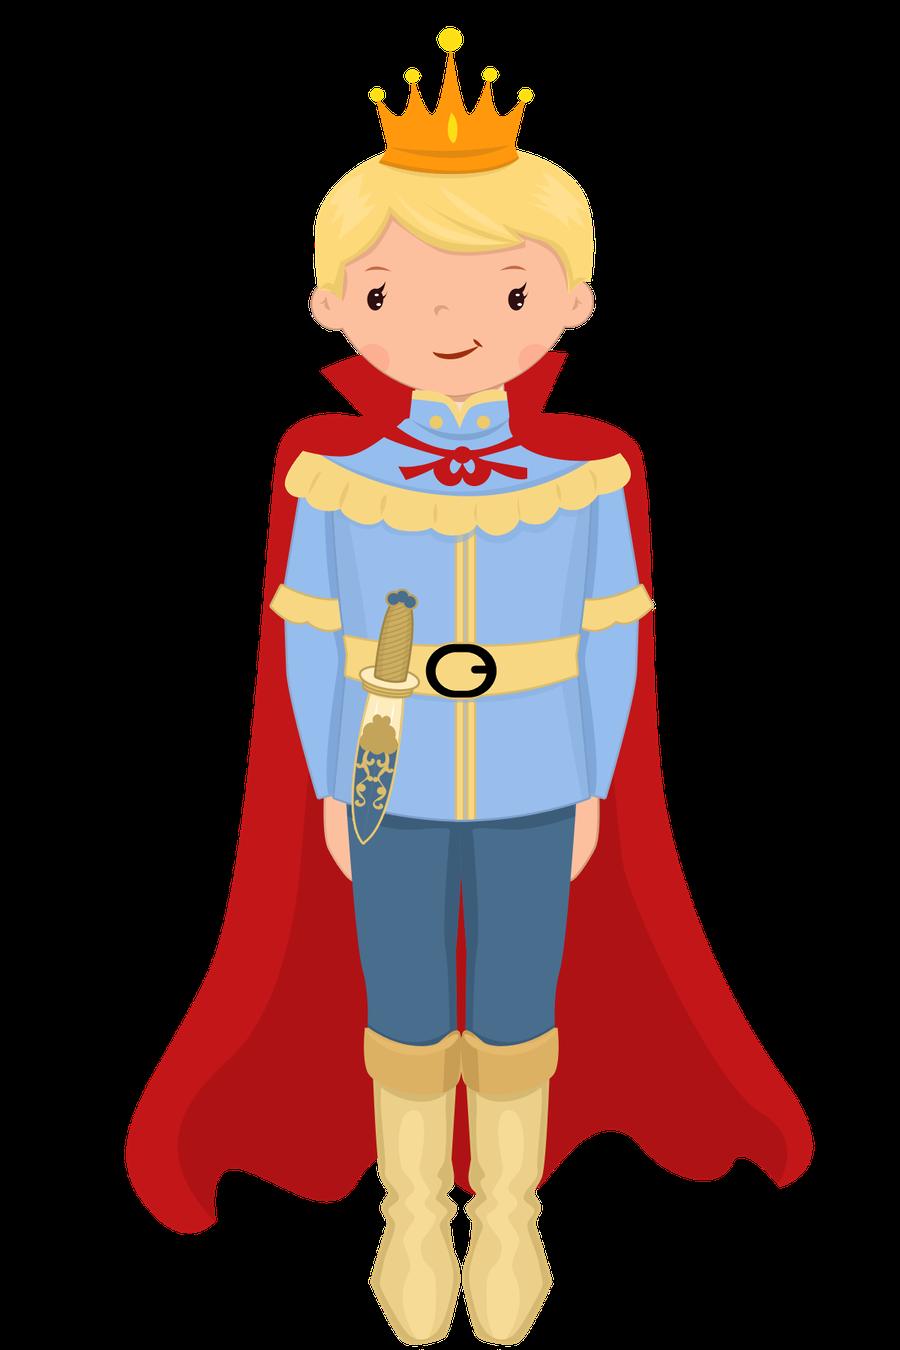 Http danimfalcao minus com. Knights clipart cute knight